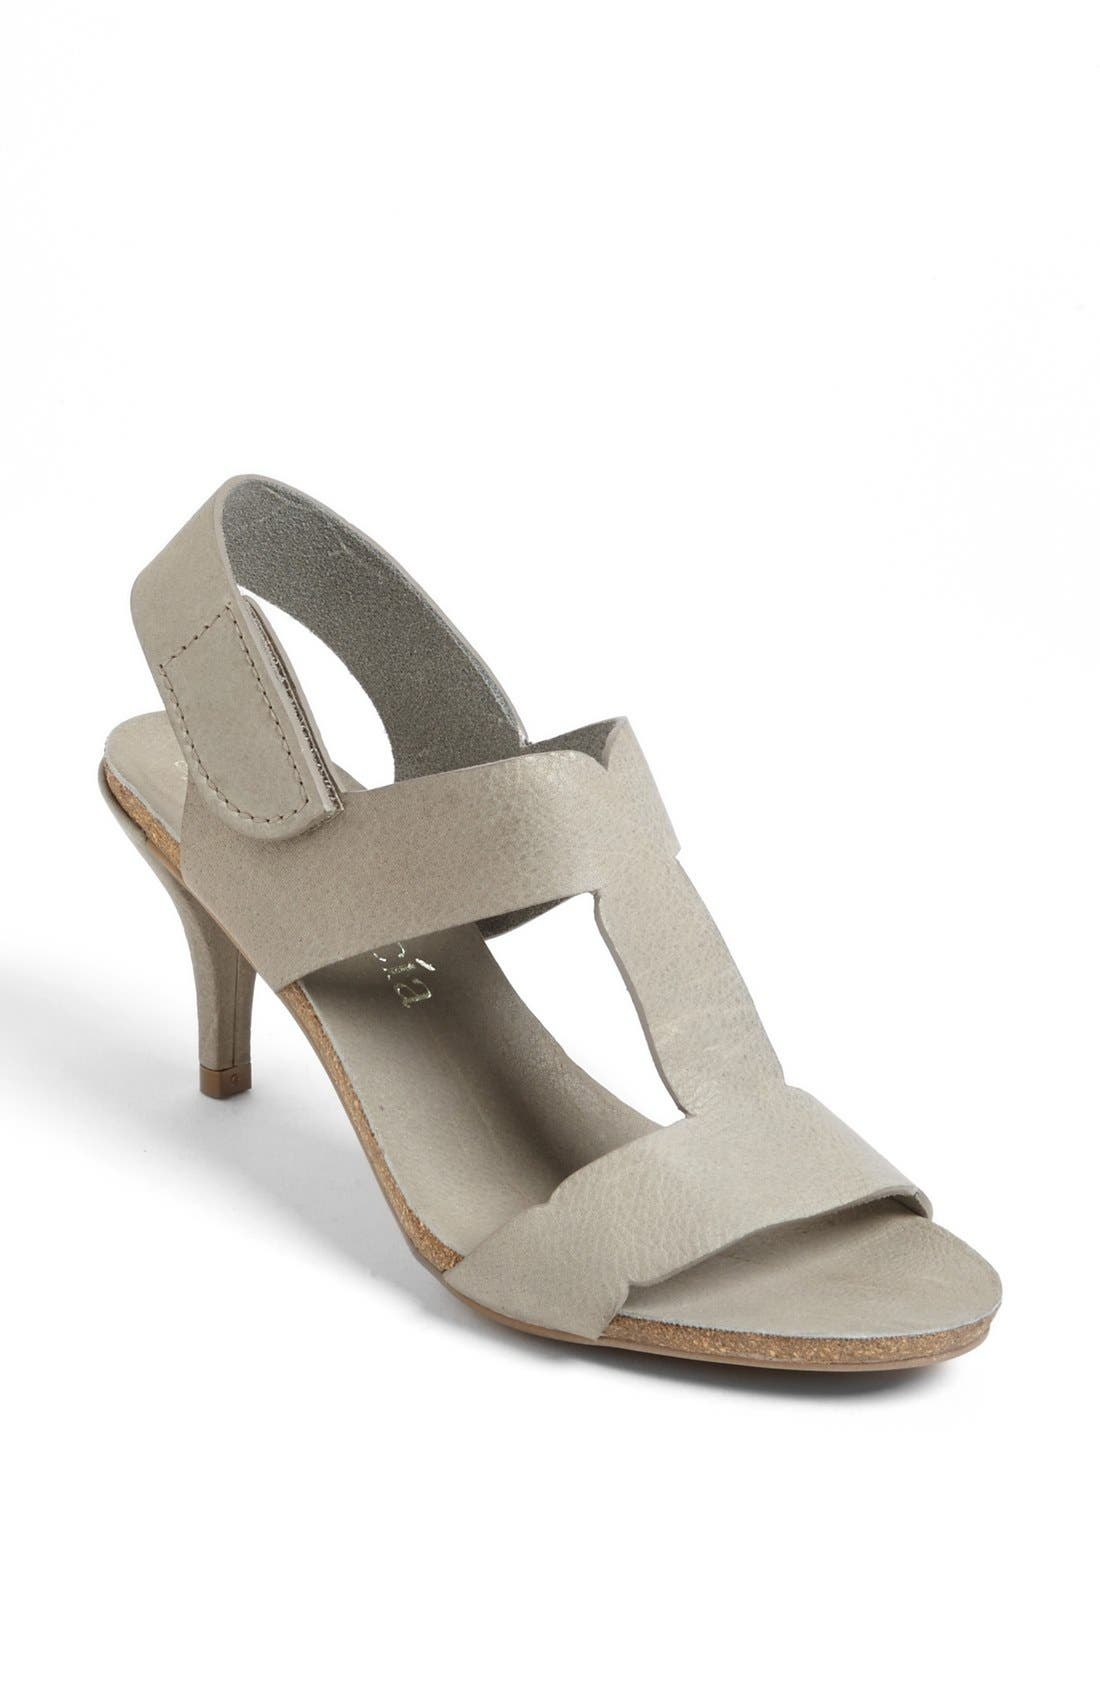 Alternate Image 1 Selected - Pedro Garcia 'Marlen' Sandal